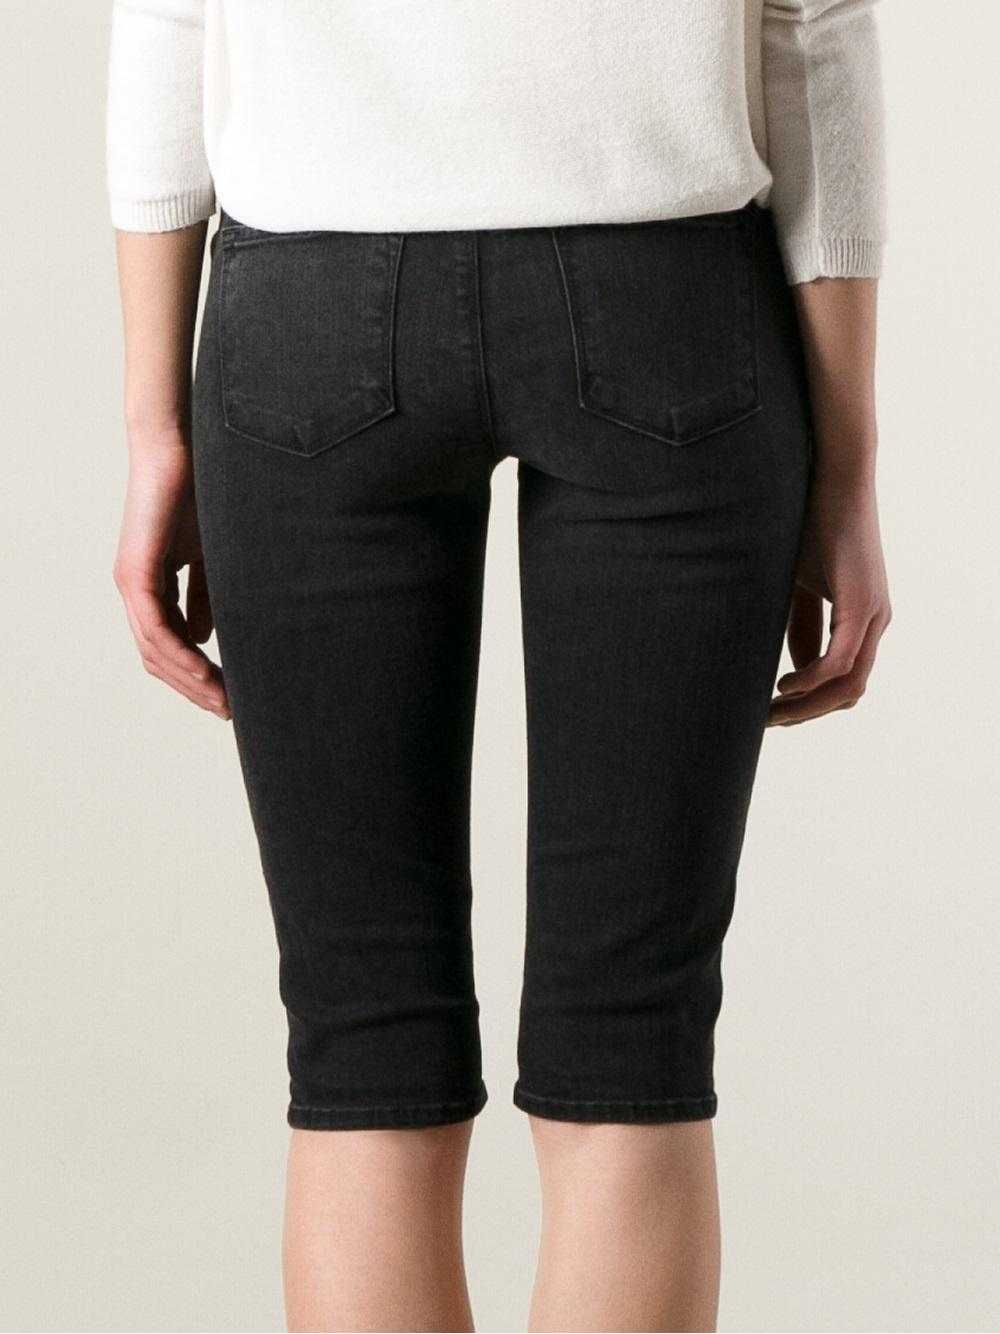 5a40d2da630 Lyst - J Brand Knee Length Denim Bike Shorts in Black